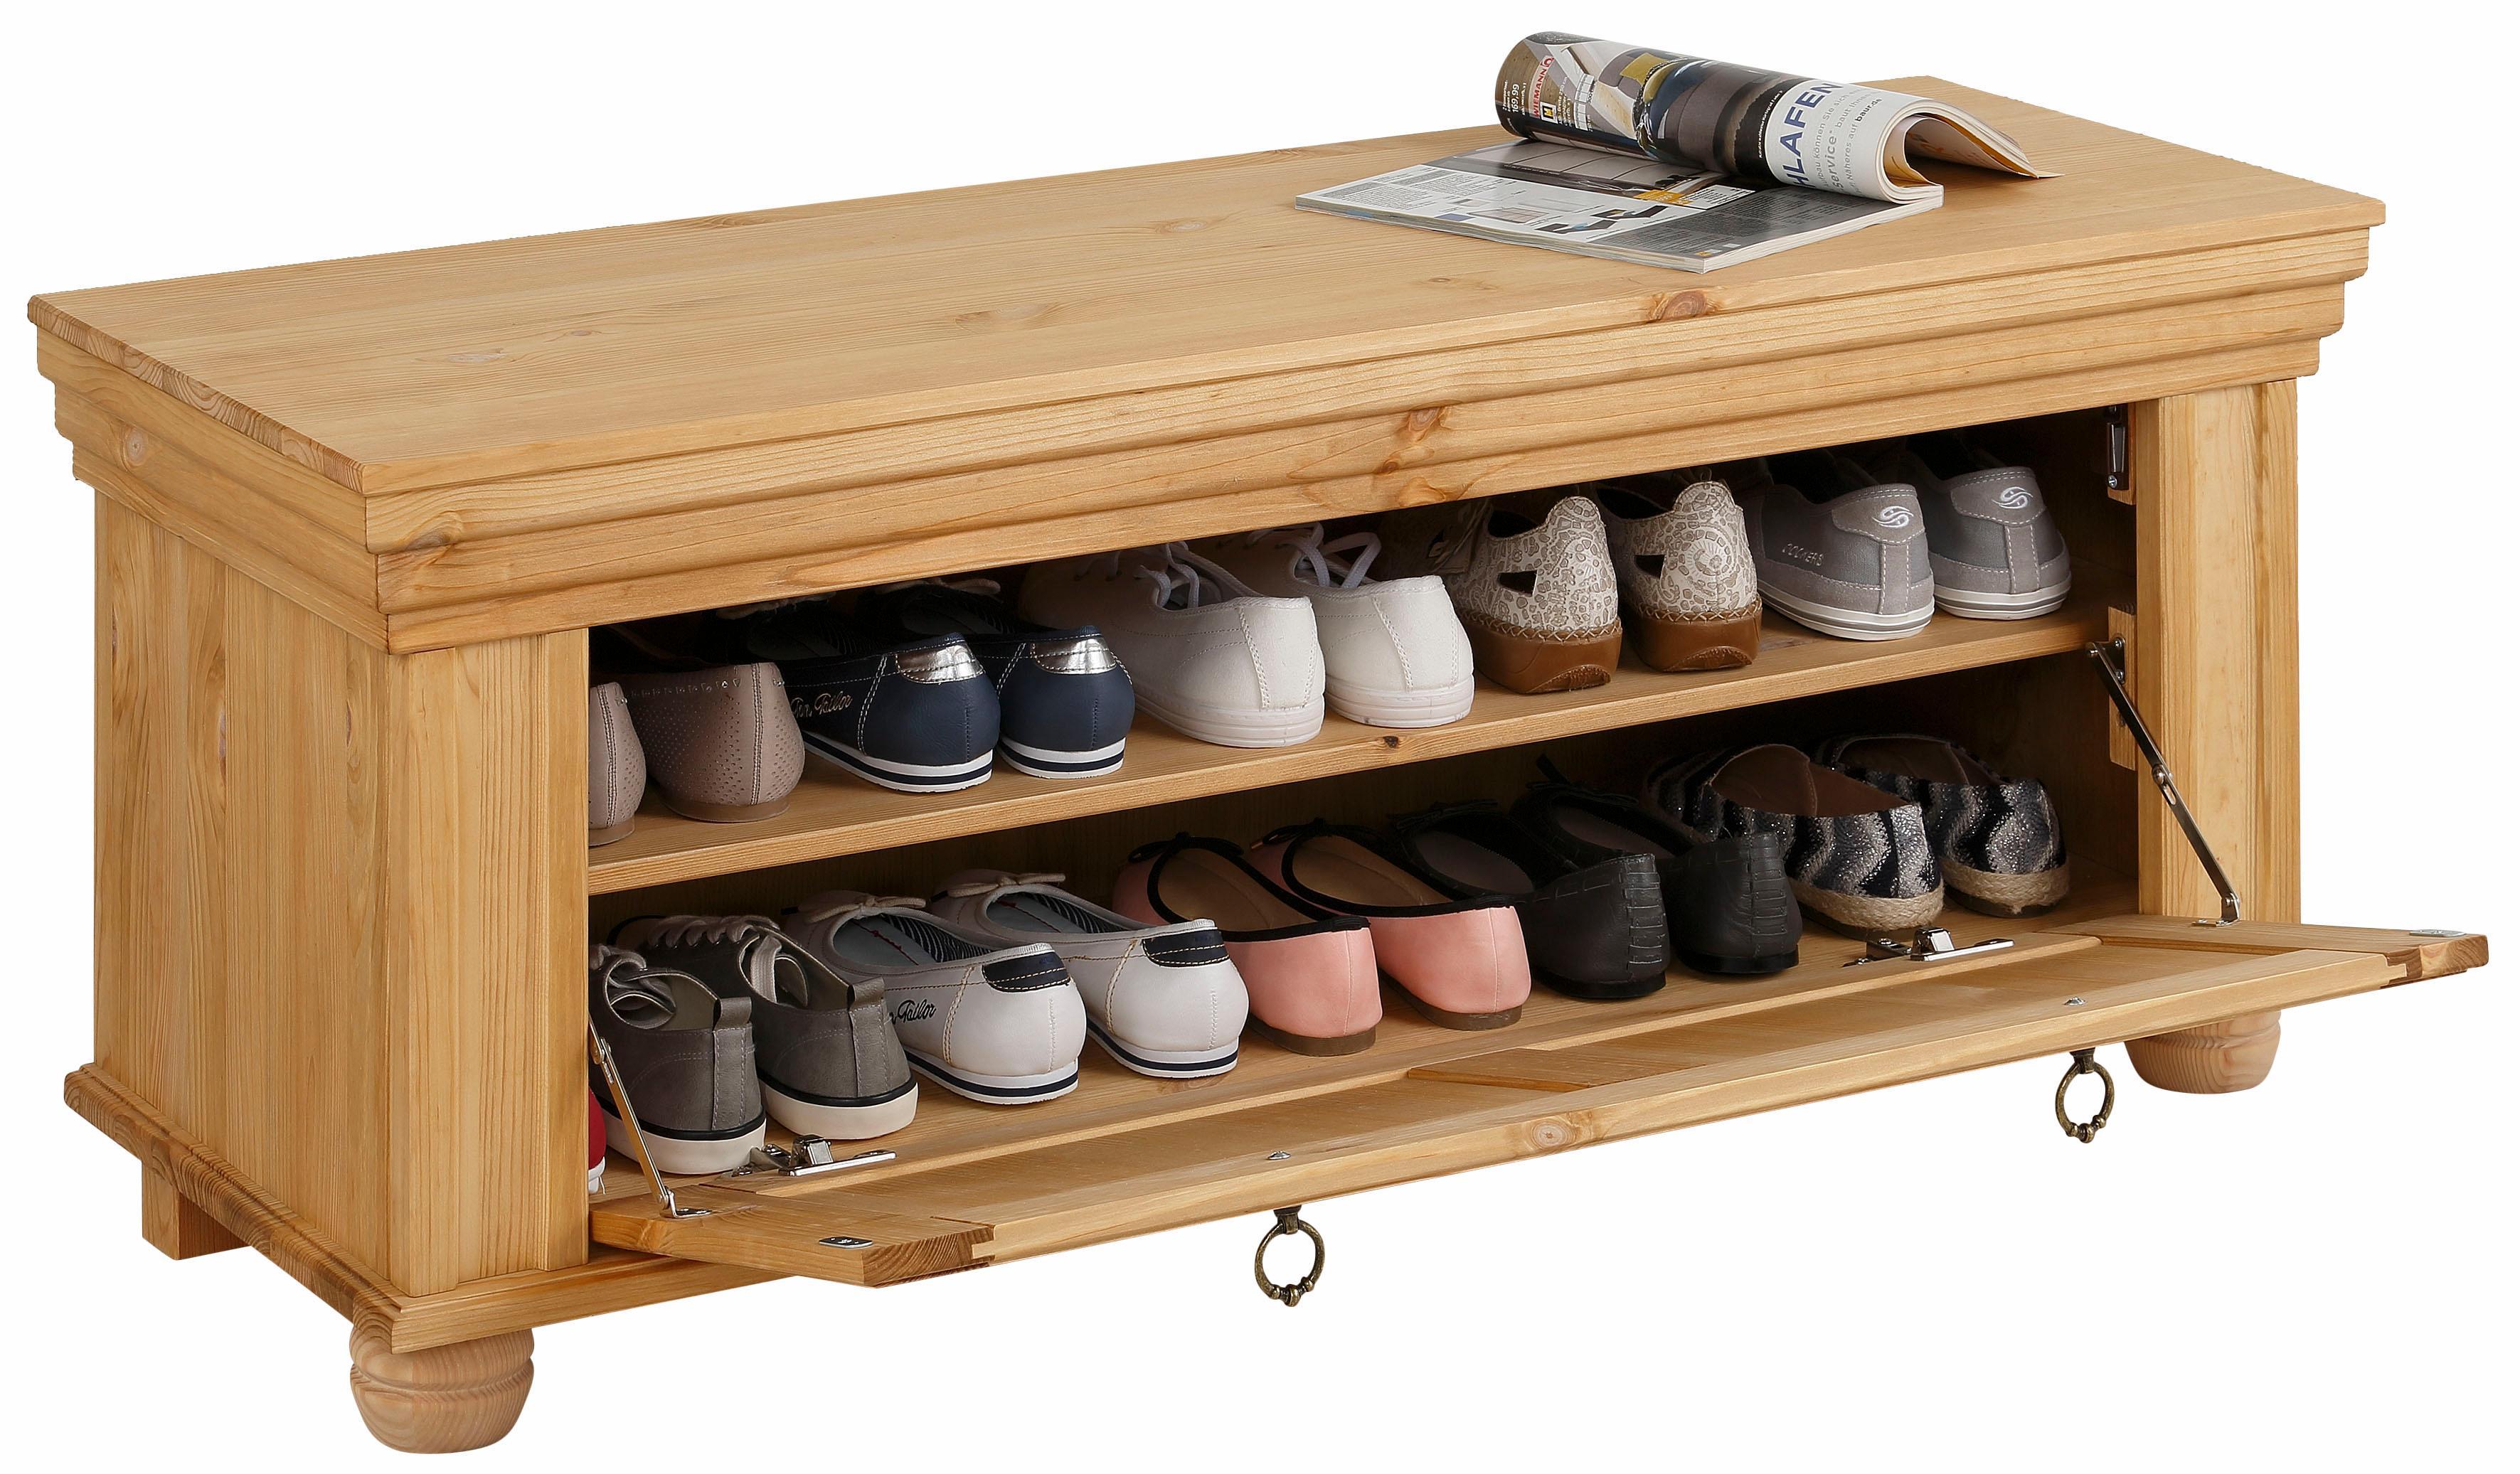 home affaire schuhbank m nchen mit dekorativen. Black Bedroom Furniture Sets. Home Design Ideas